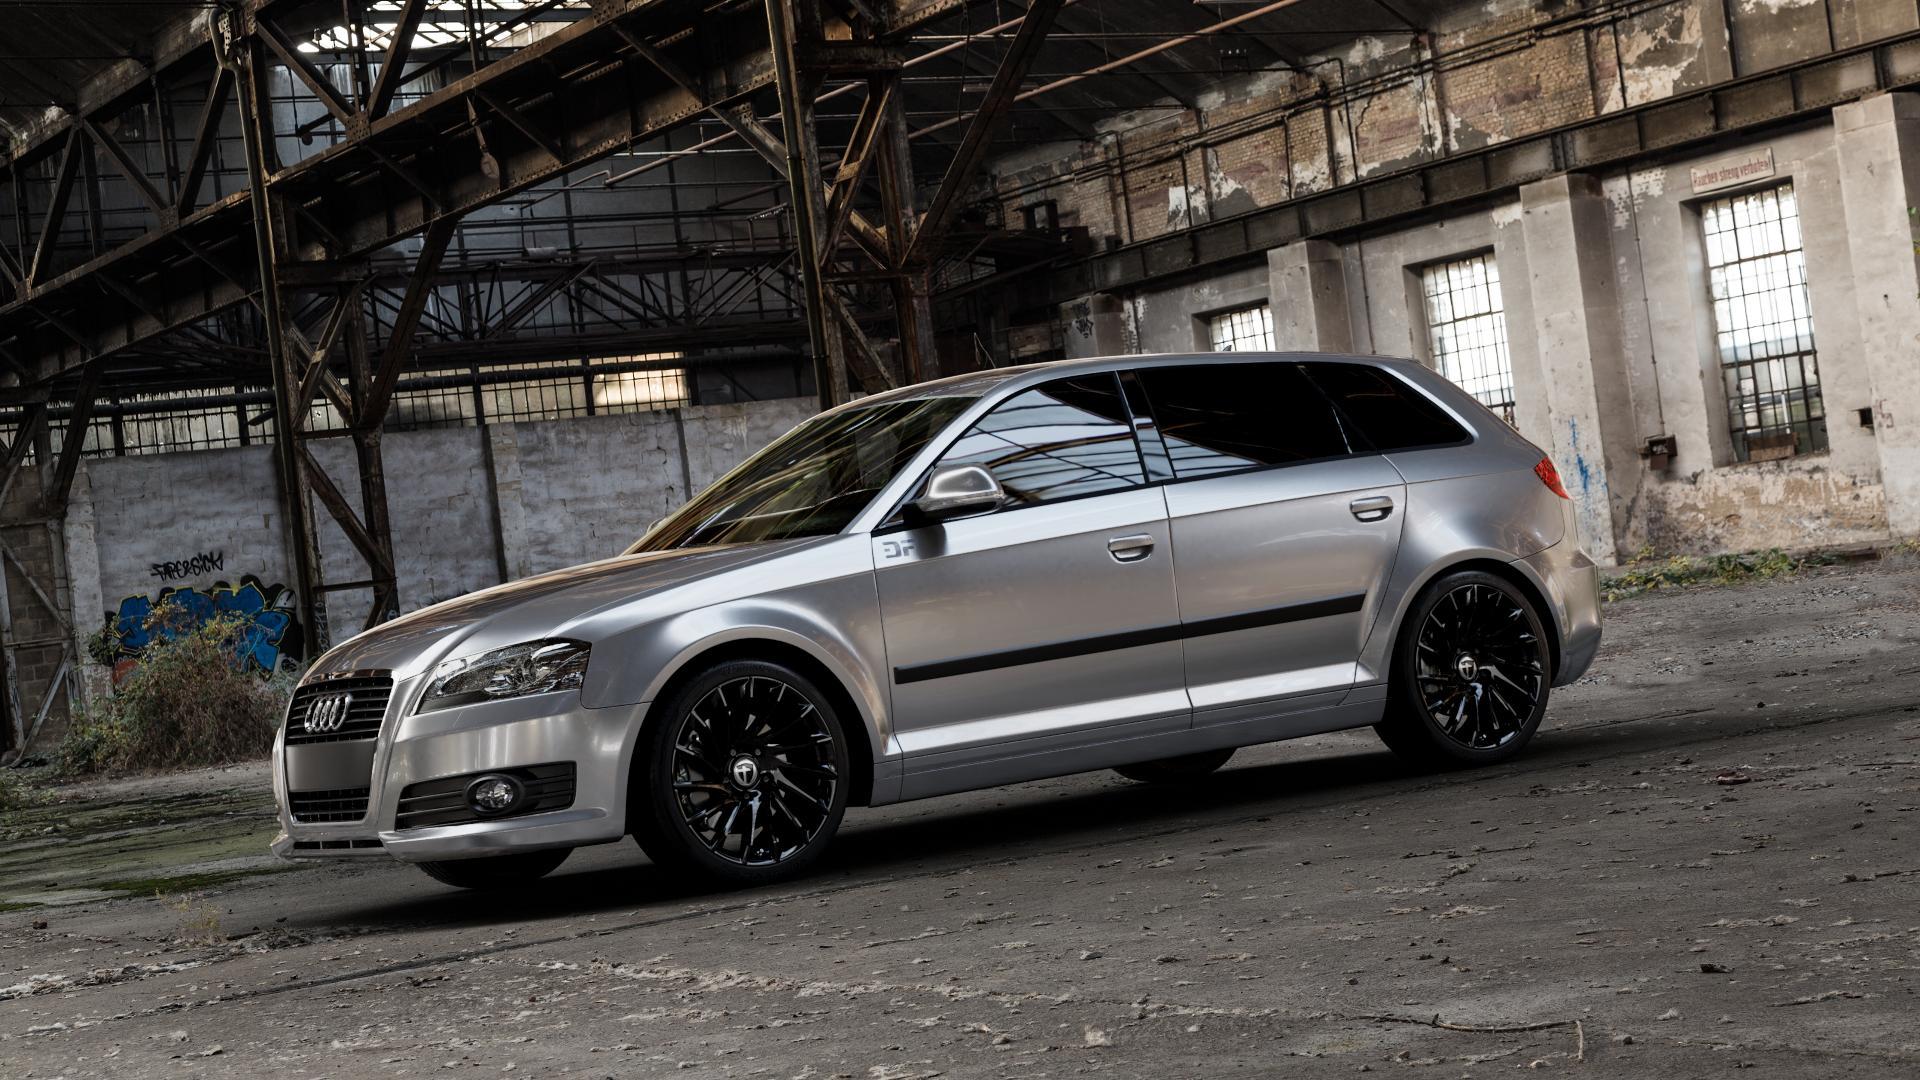 TOMASON TN16 Black painted Felge mit Reifen schwarz in 18Zoll Winterfelge Alufelge auf silbernem Audi A3 Typ 8P (Sportback) 1,6l 75kW (102 PS) 2,0l FSI 110kW (150 1,9l TDI 77kW (105 103kW (140 TFSI 147kW (200 85kW (116 100kW (136 1,8l 118kW (160 125kW (170 1,4l 92kW (125 120kW (163 quattro 3,2l V6 184kW (250 S3 195kW (265 1,2l 66kW (90